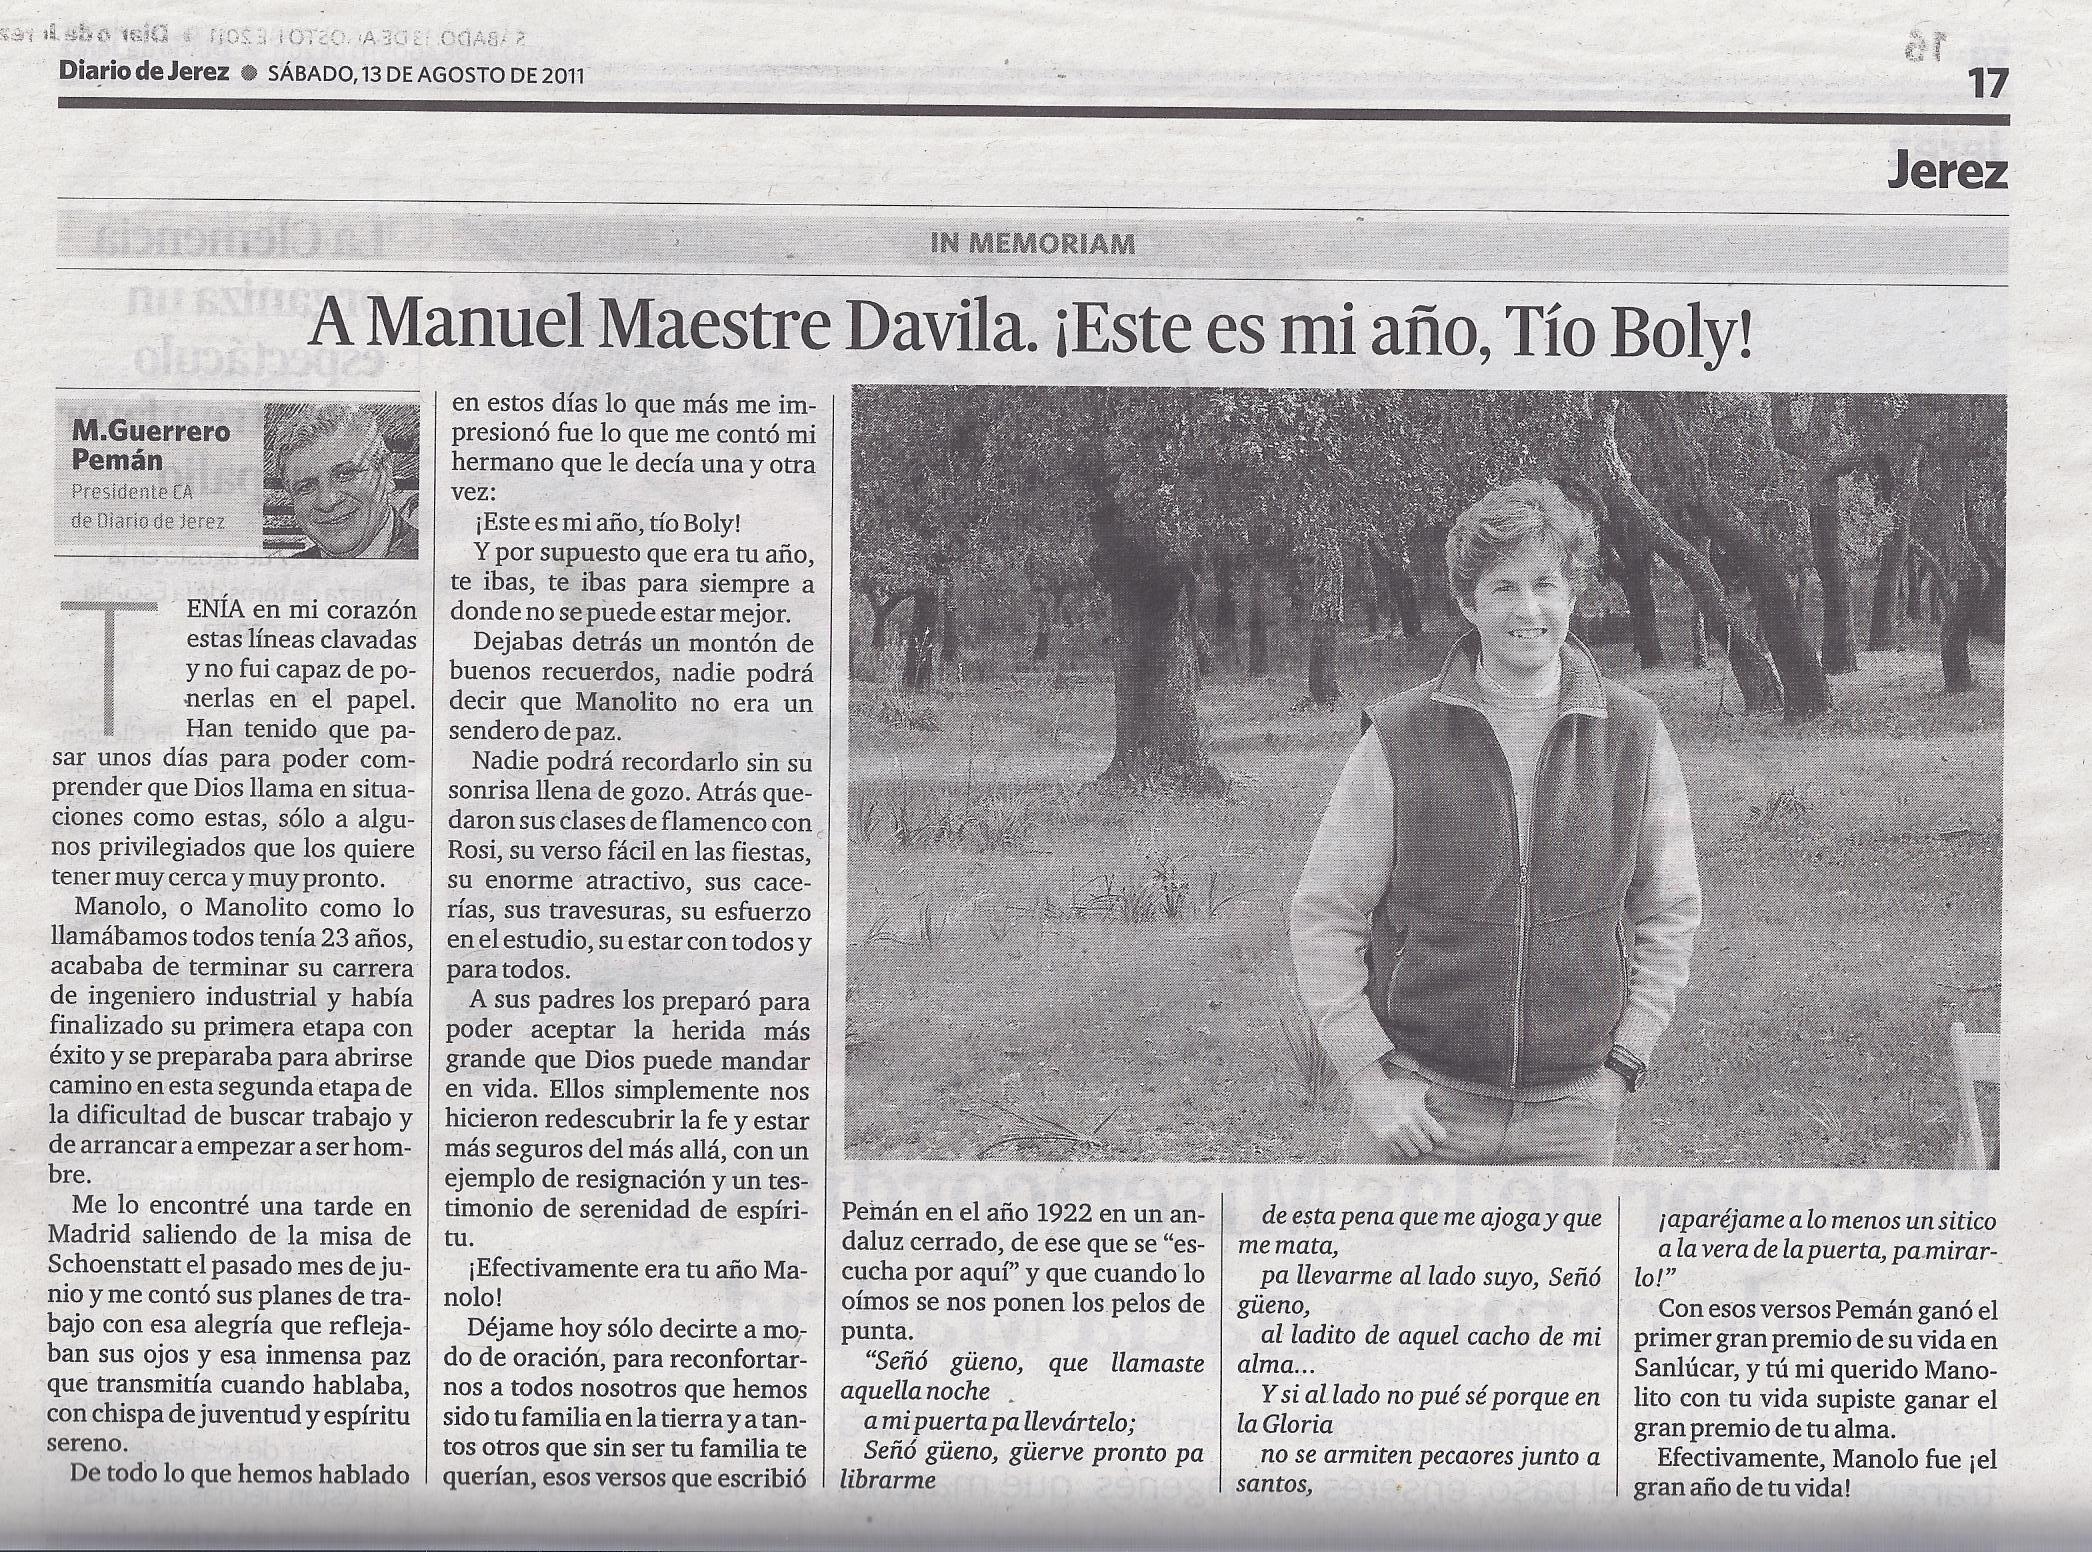 manuel-maestre-davila-13082011.jpg